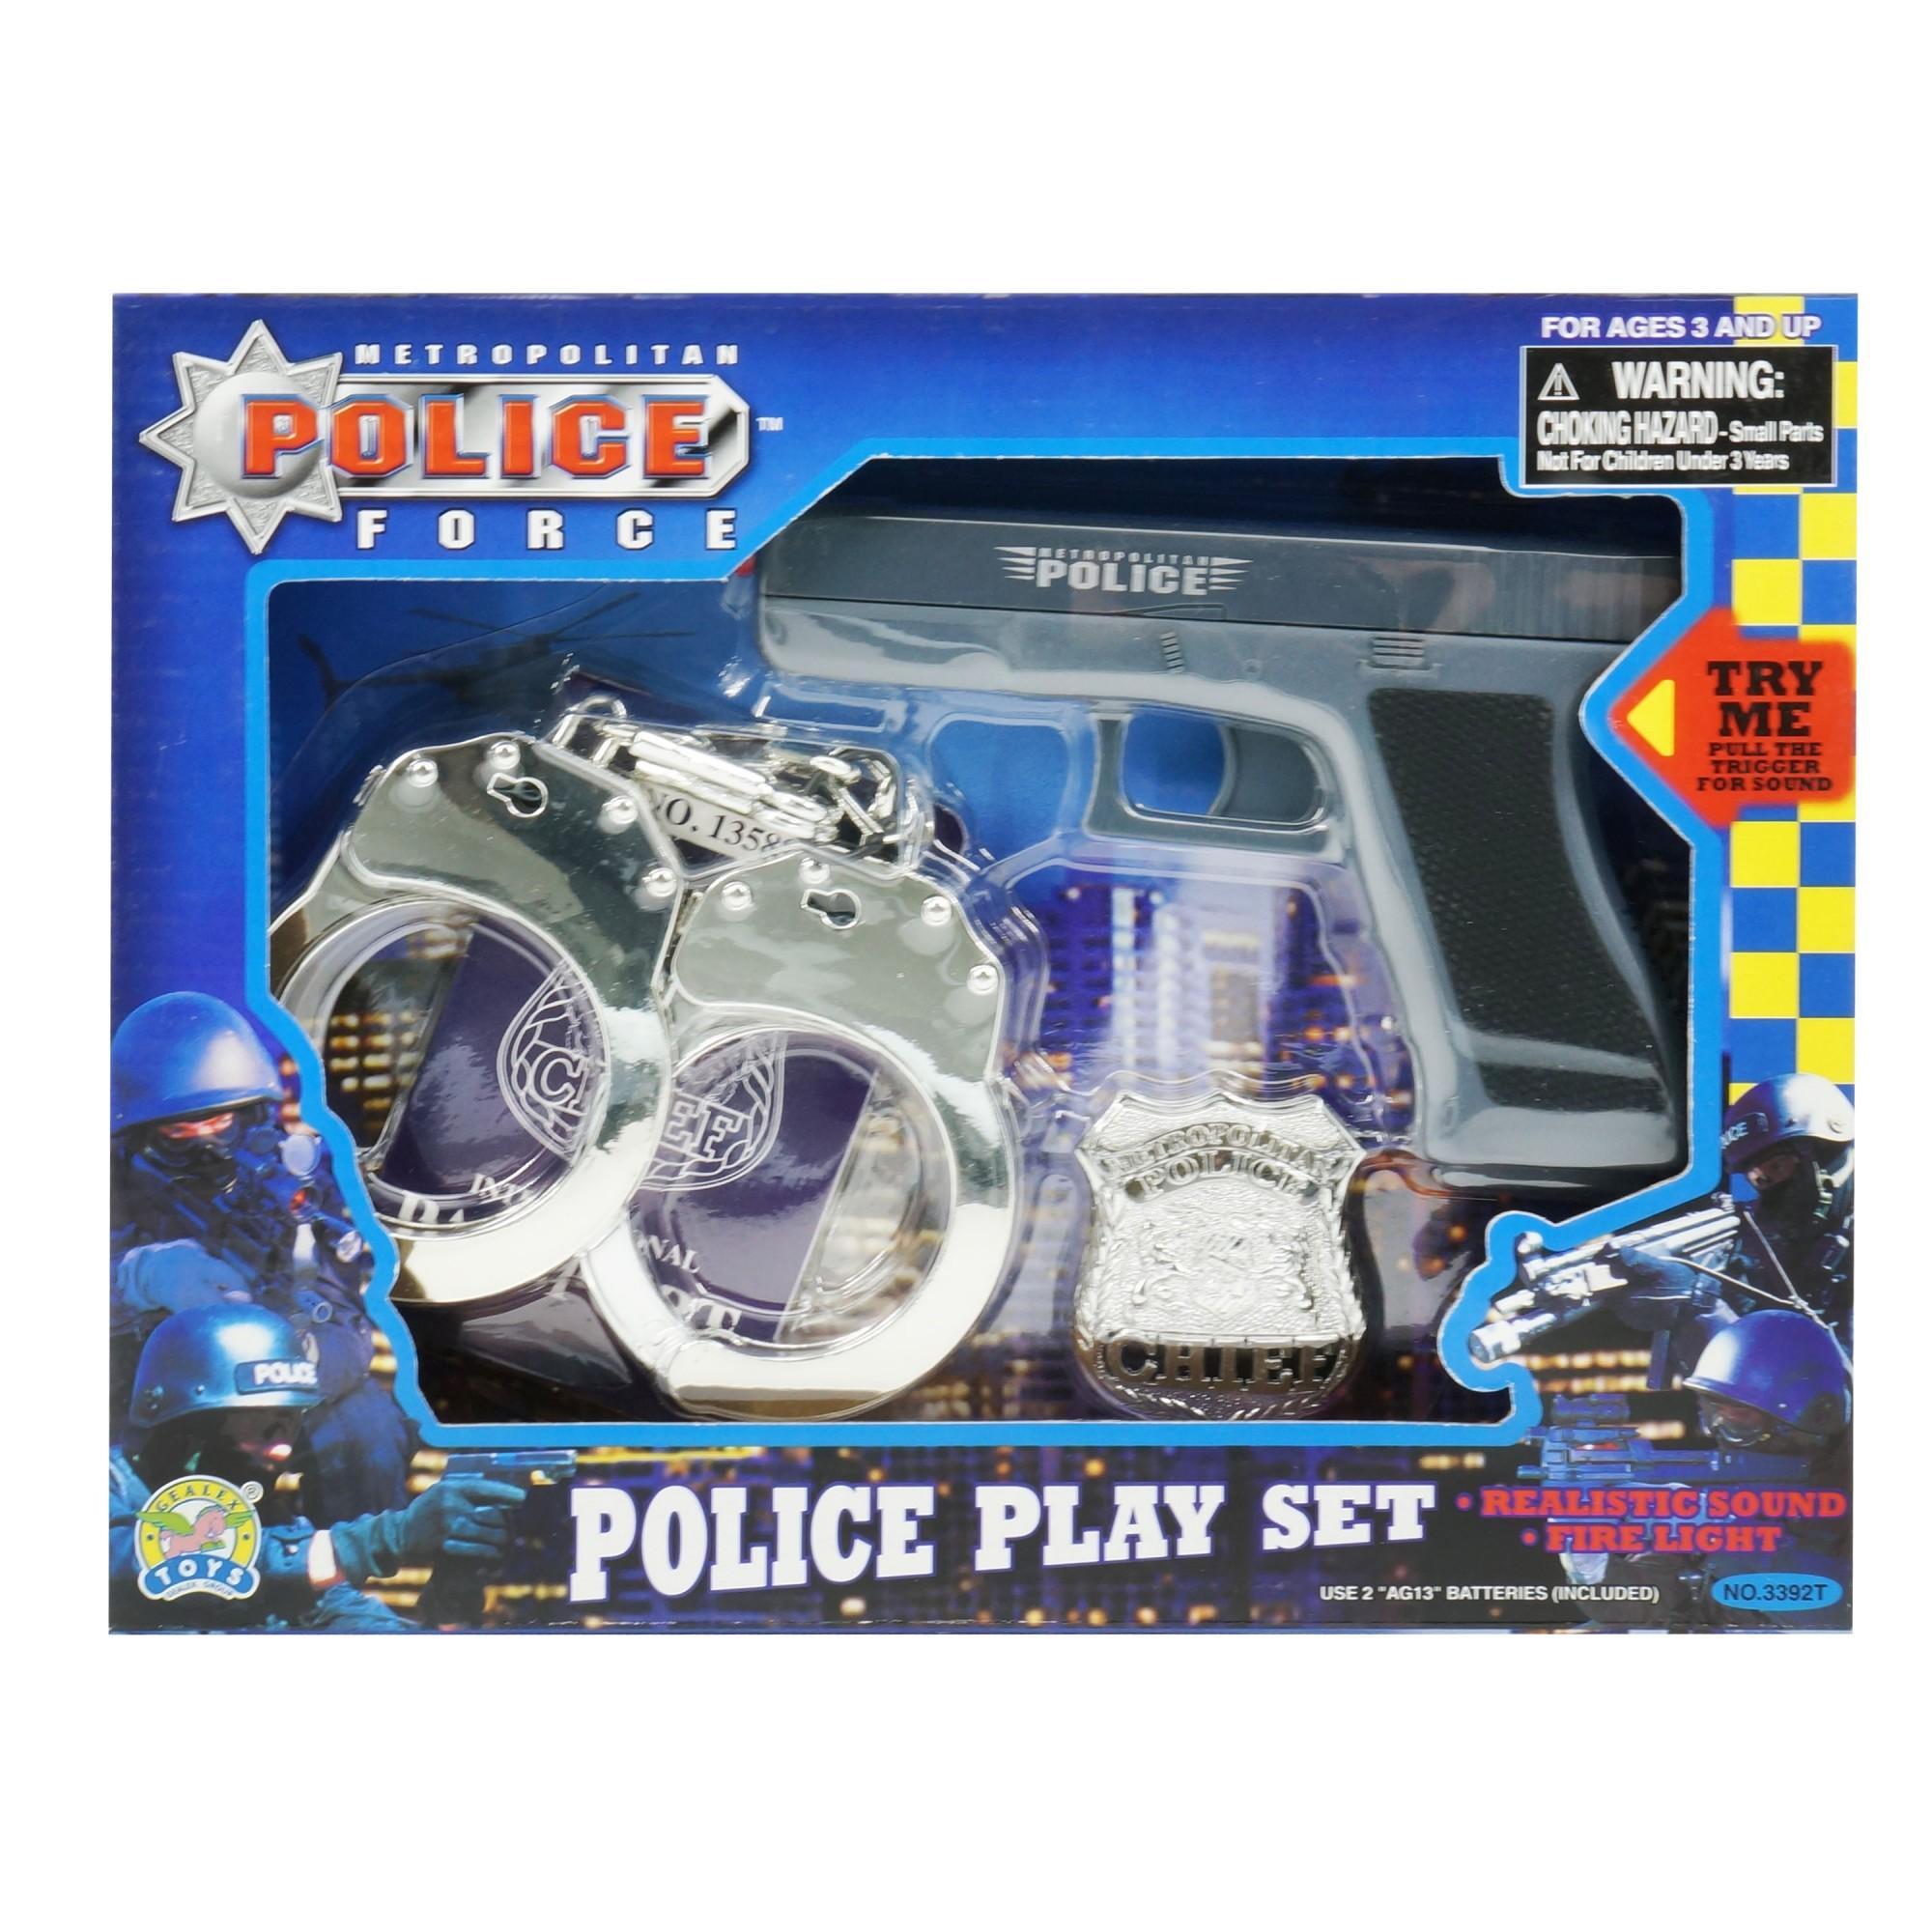 Electronic Police Play Set (Glock 17)